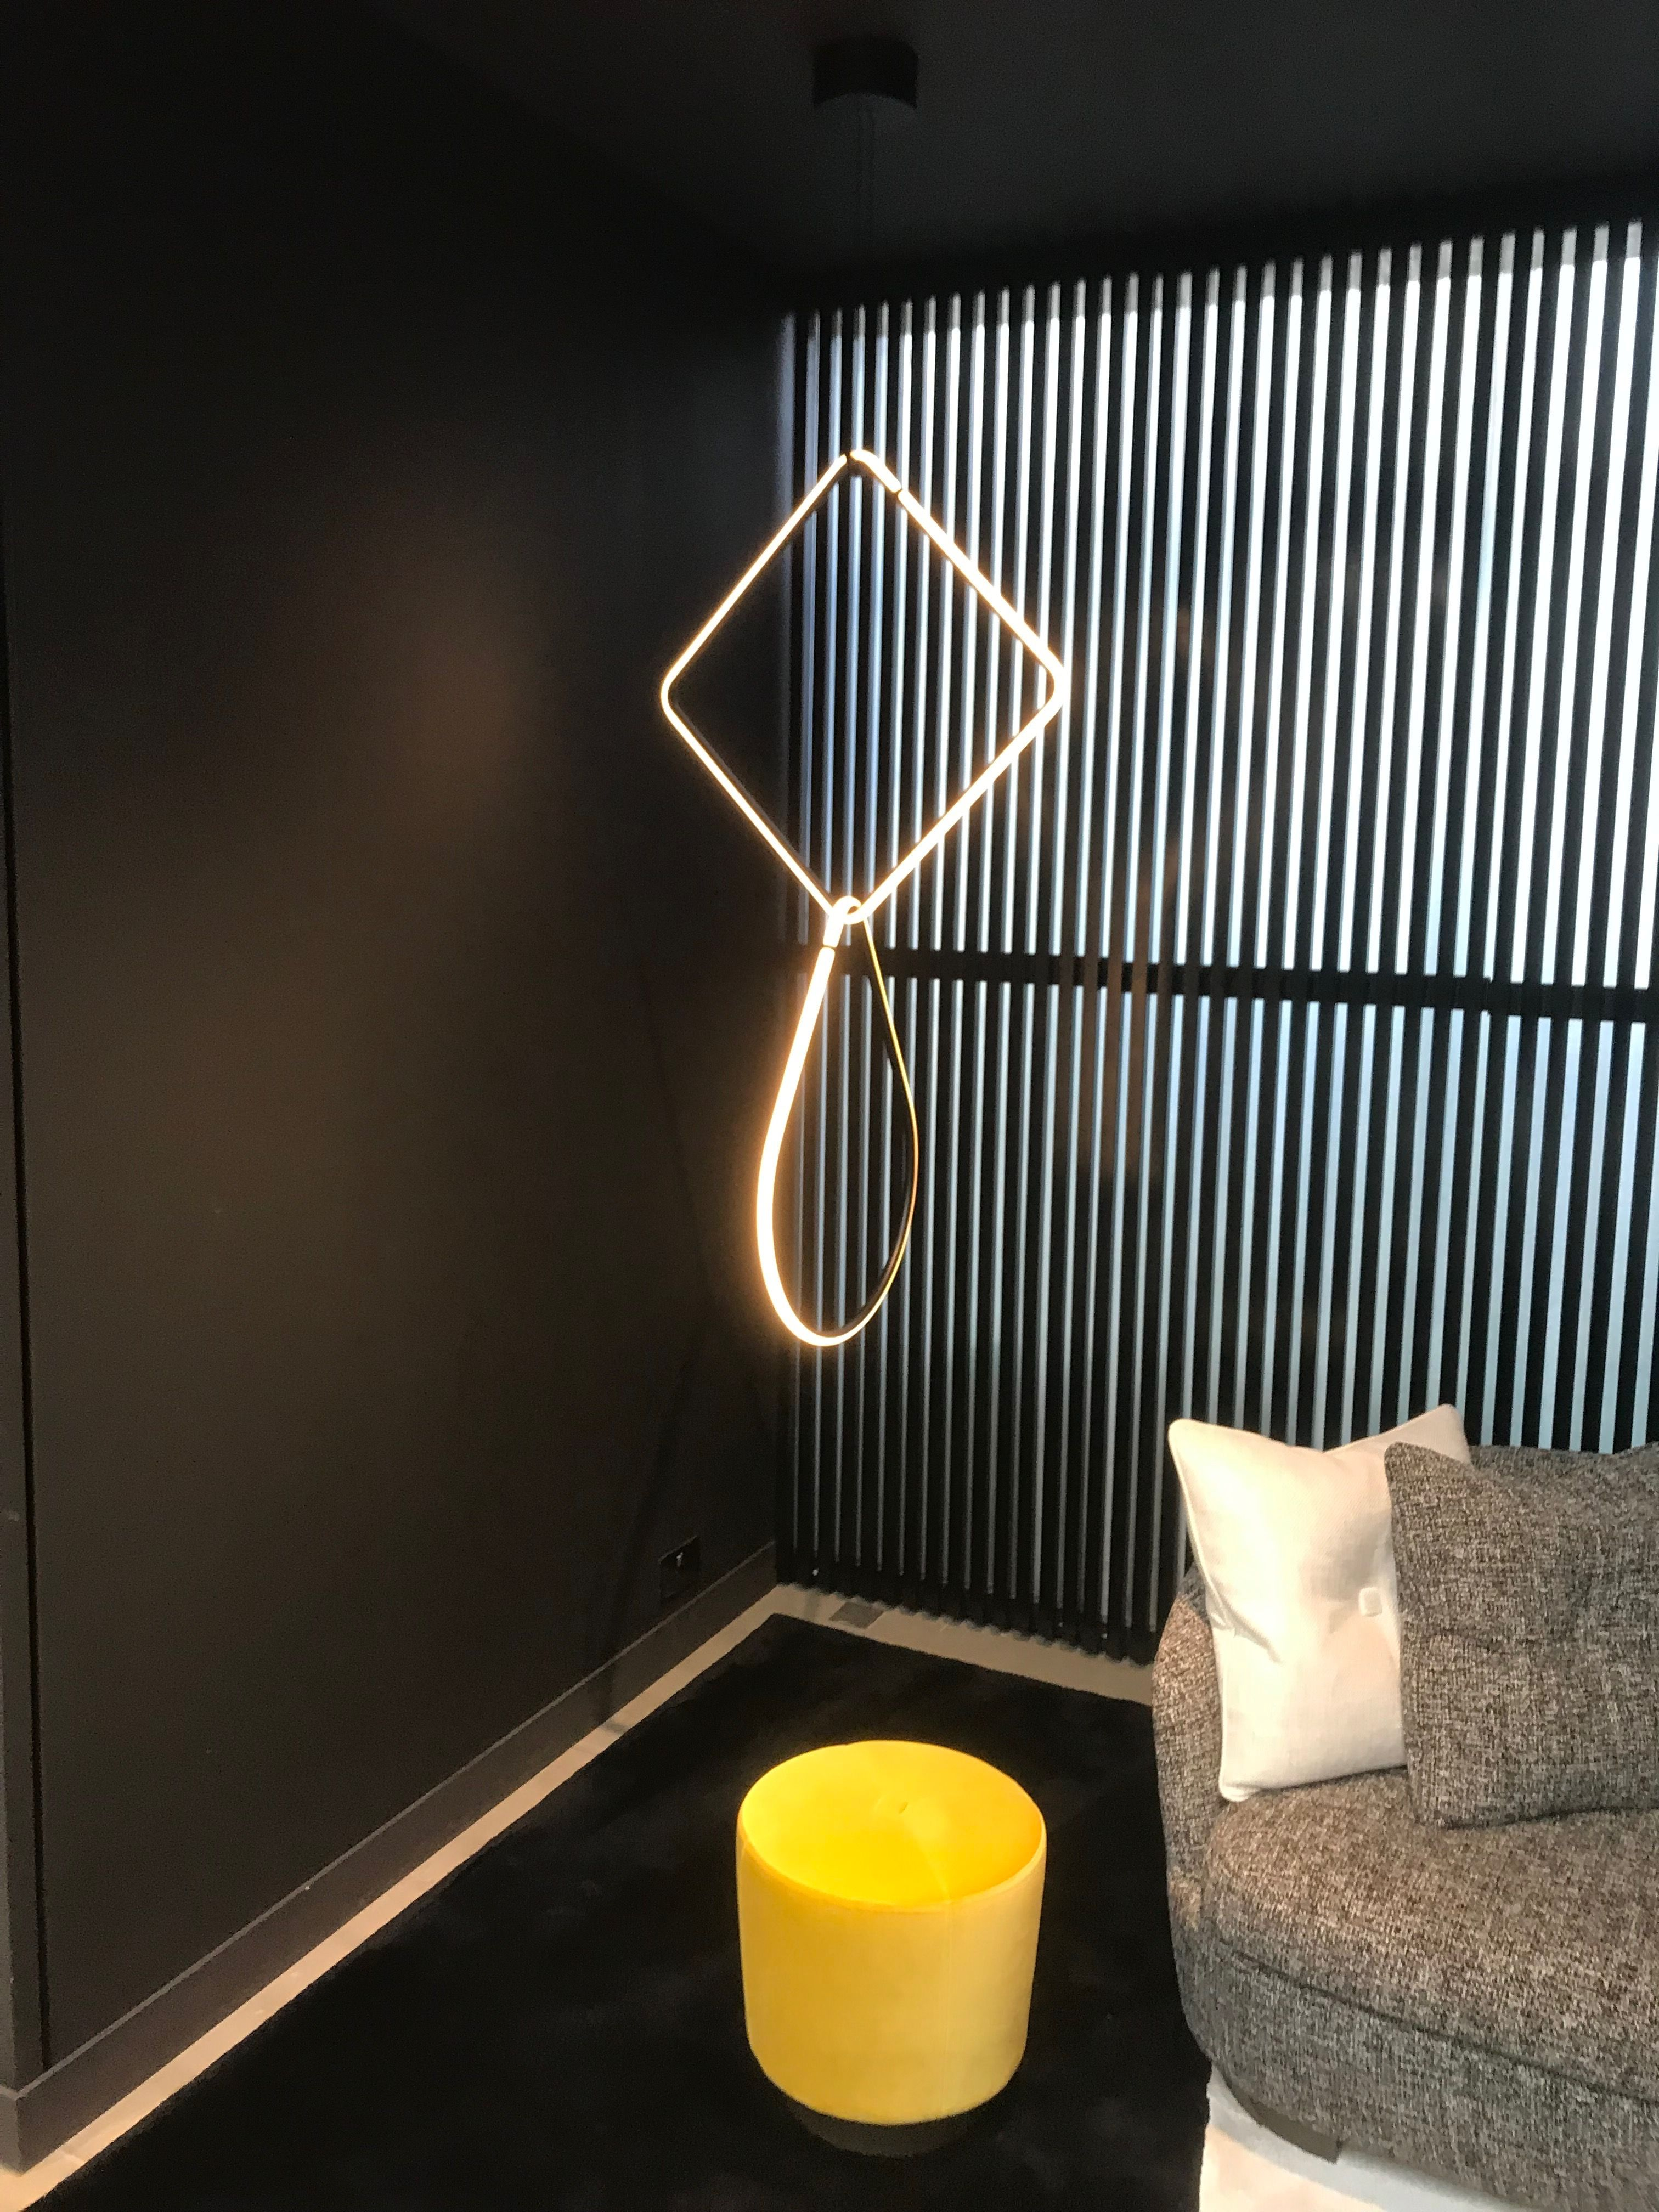 Minotti Light Feature Design Inspirations For Next